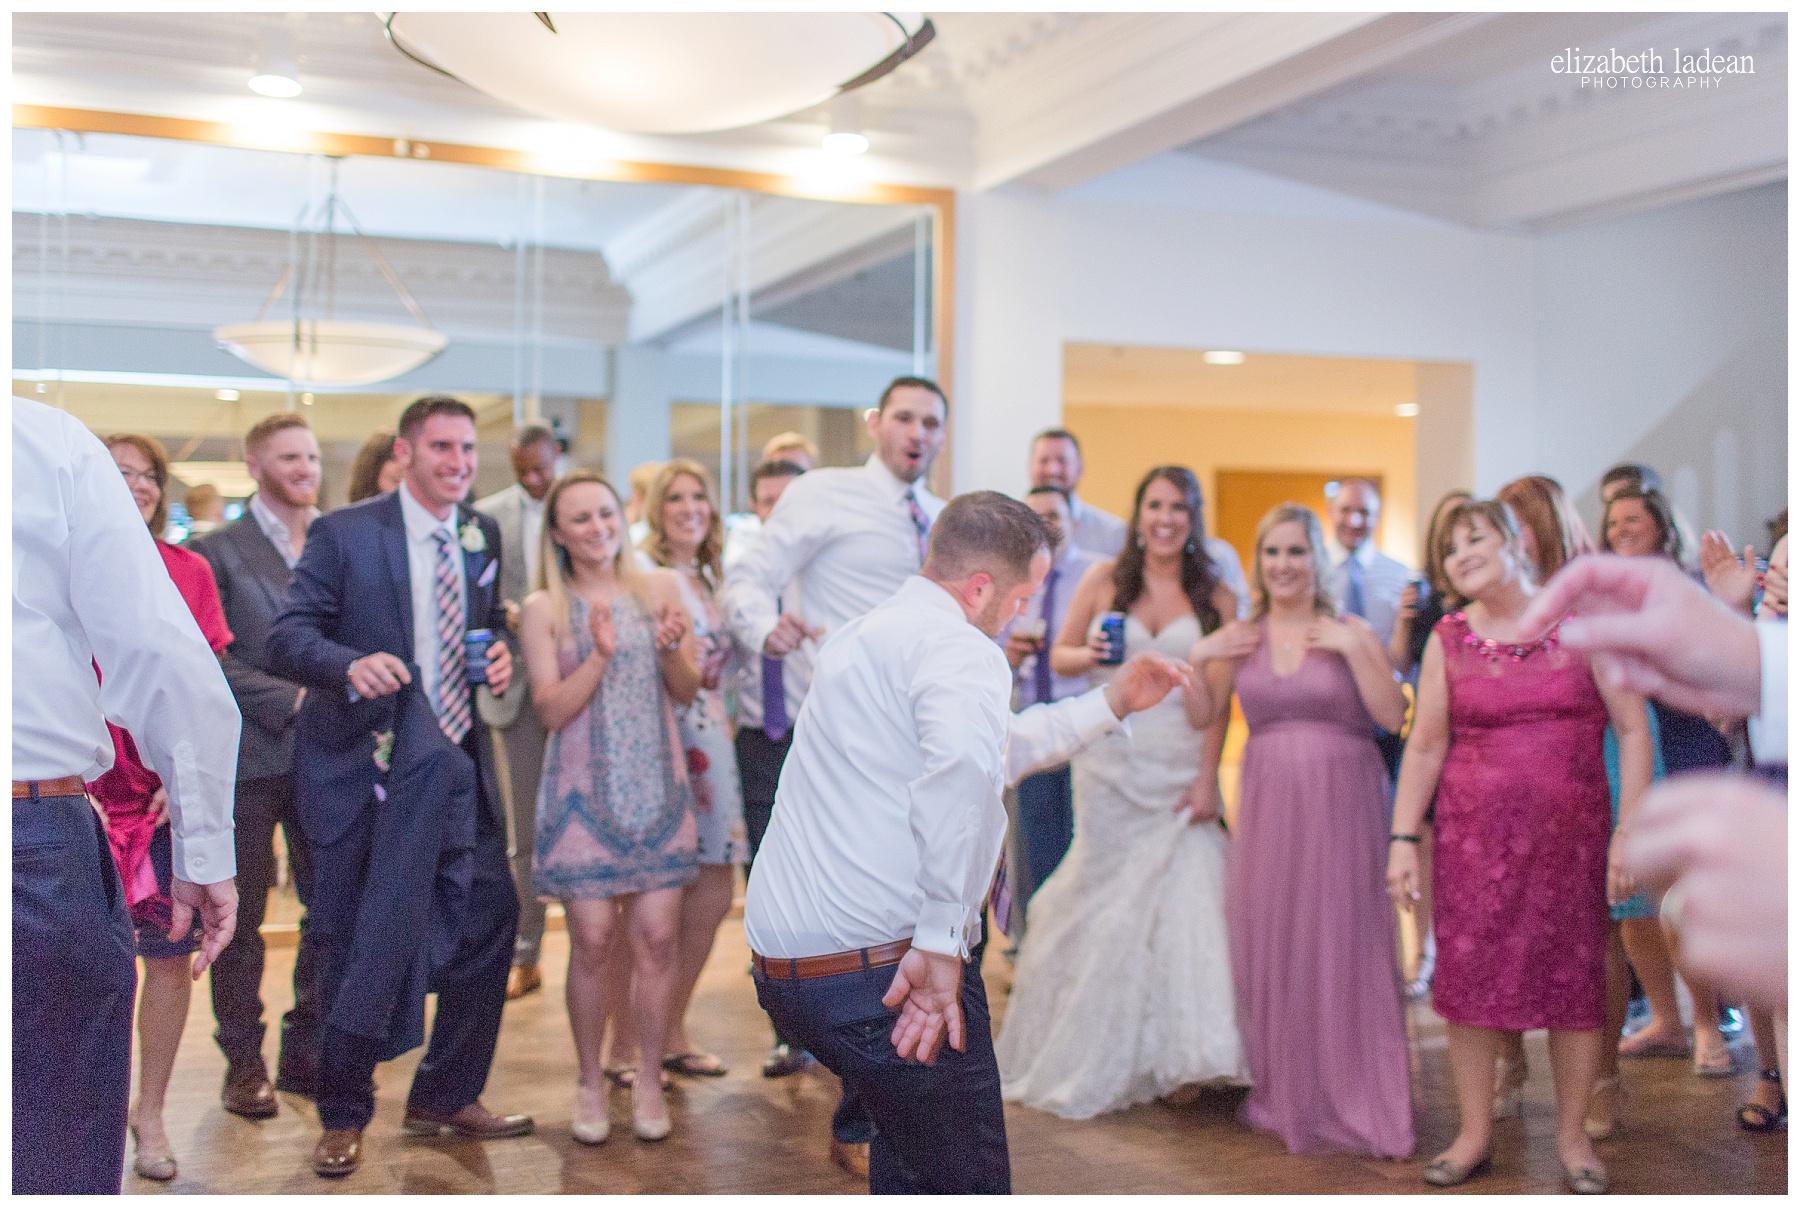 Hillcrest-Country-Club-Kansas-City-Wedding-Photography-E+J-0520-Elizabeth-Ladean-Photography-photo_0887.jpg